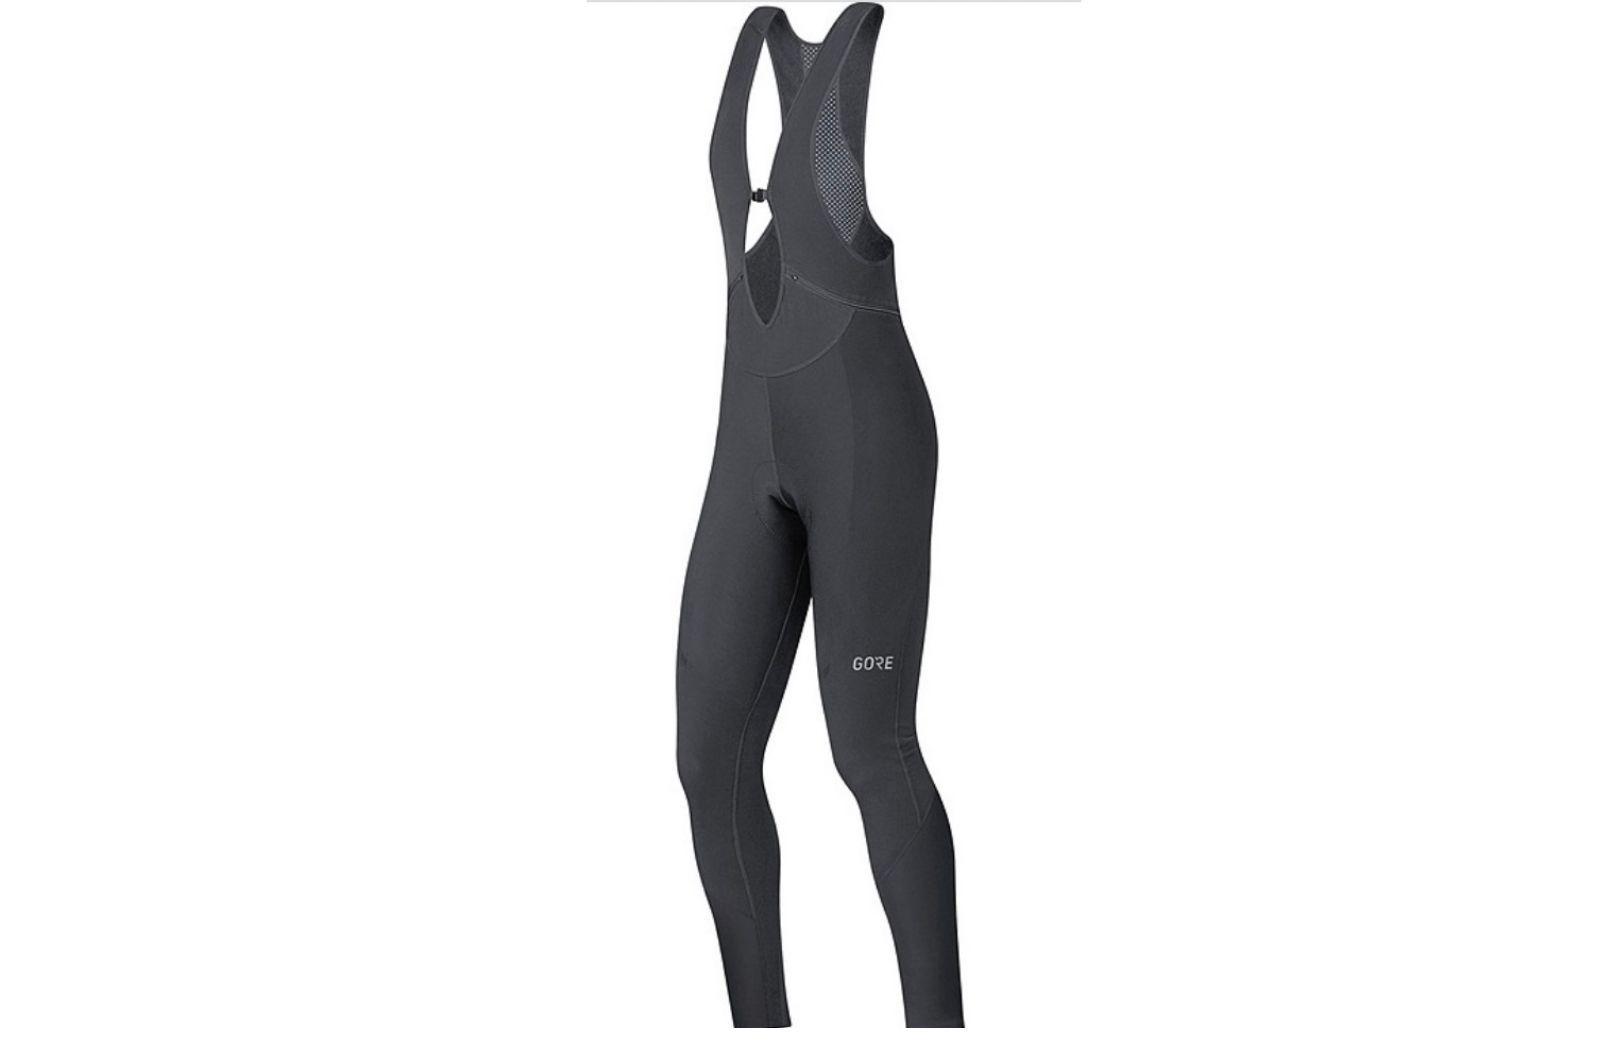 gorewear c3 tights best womens cycling shorts